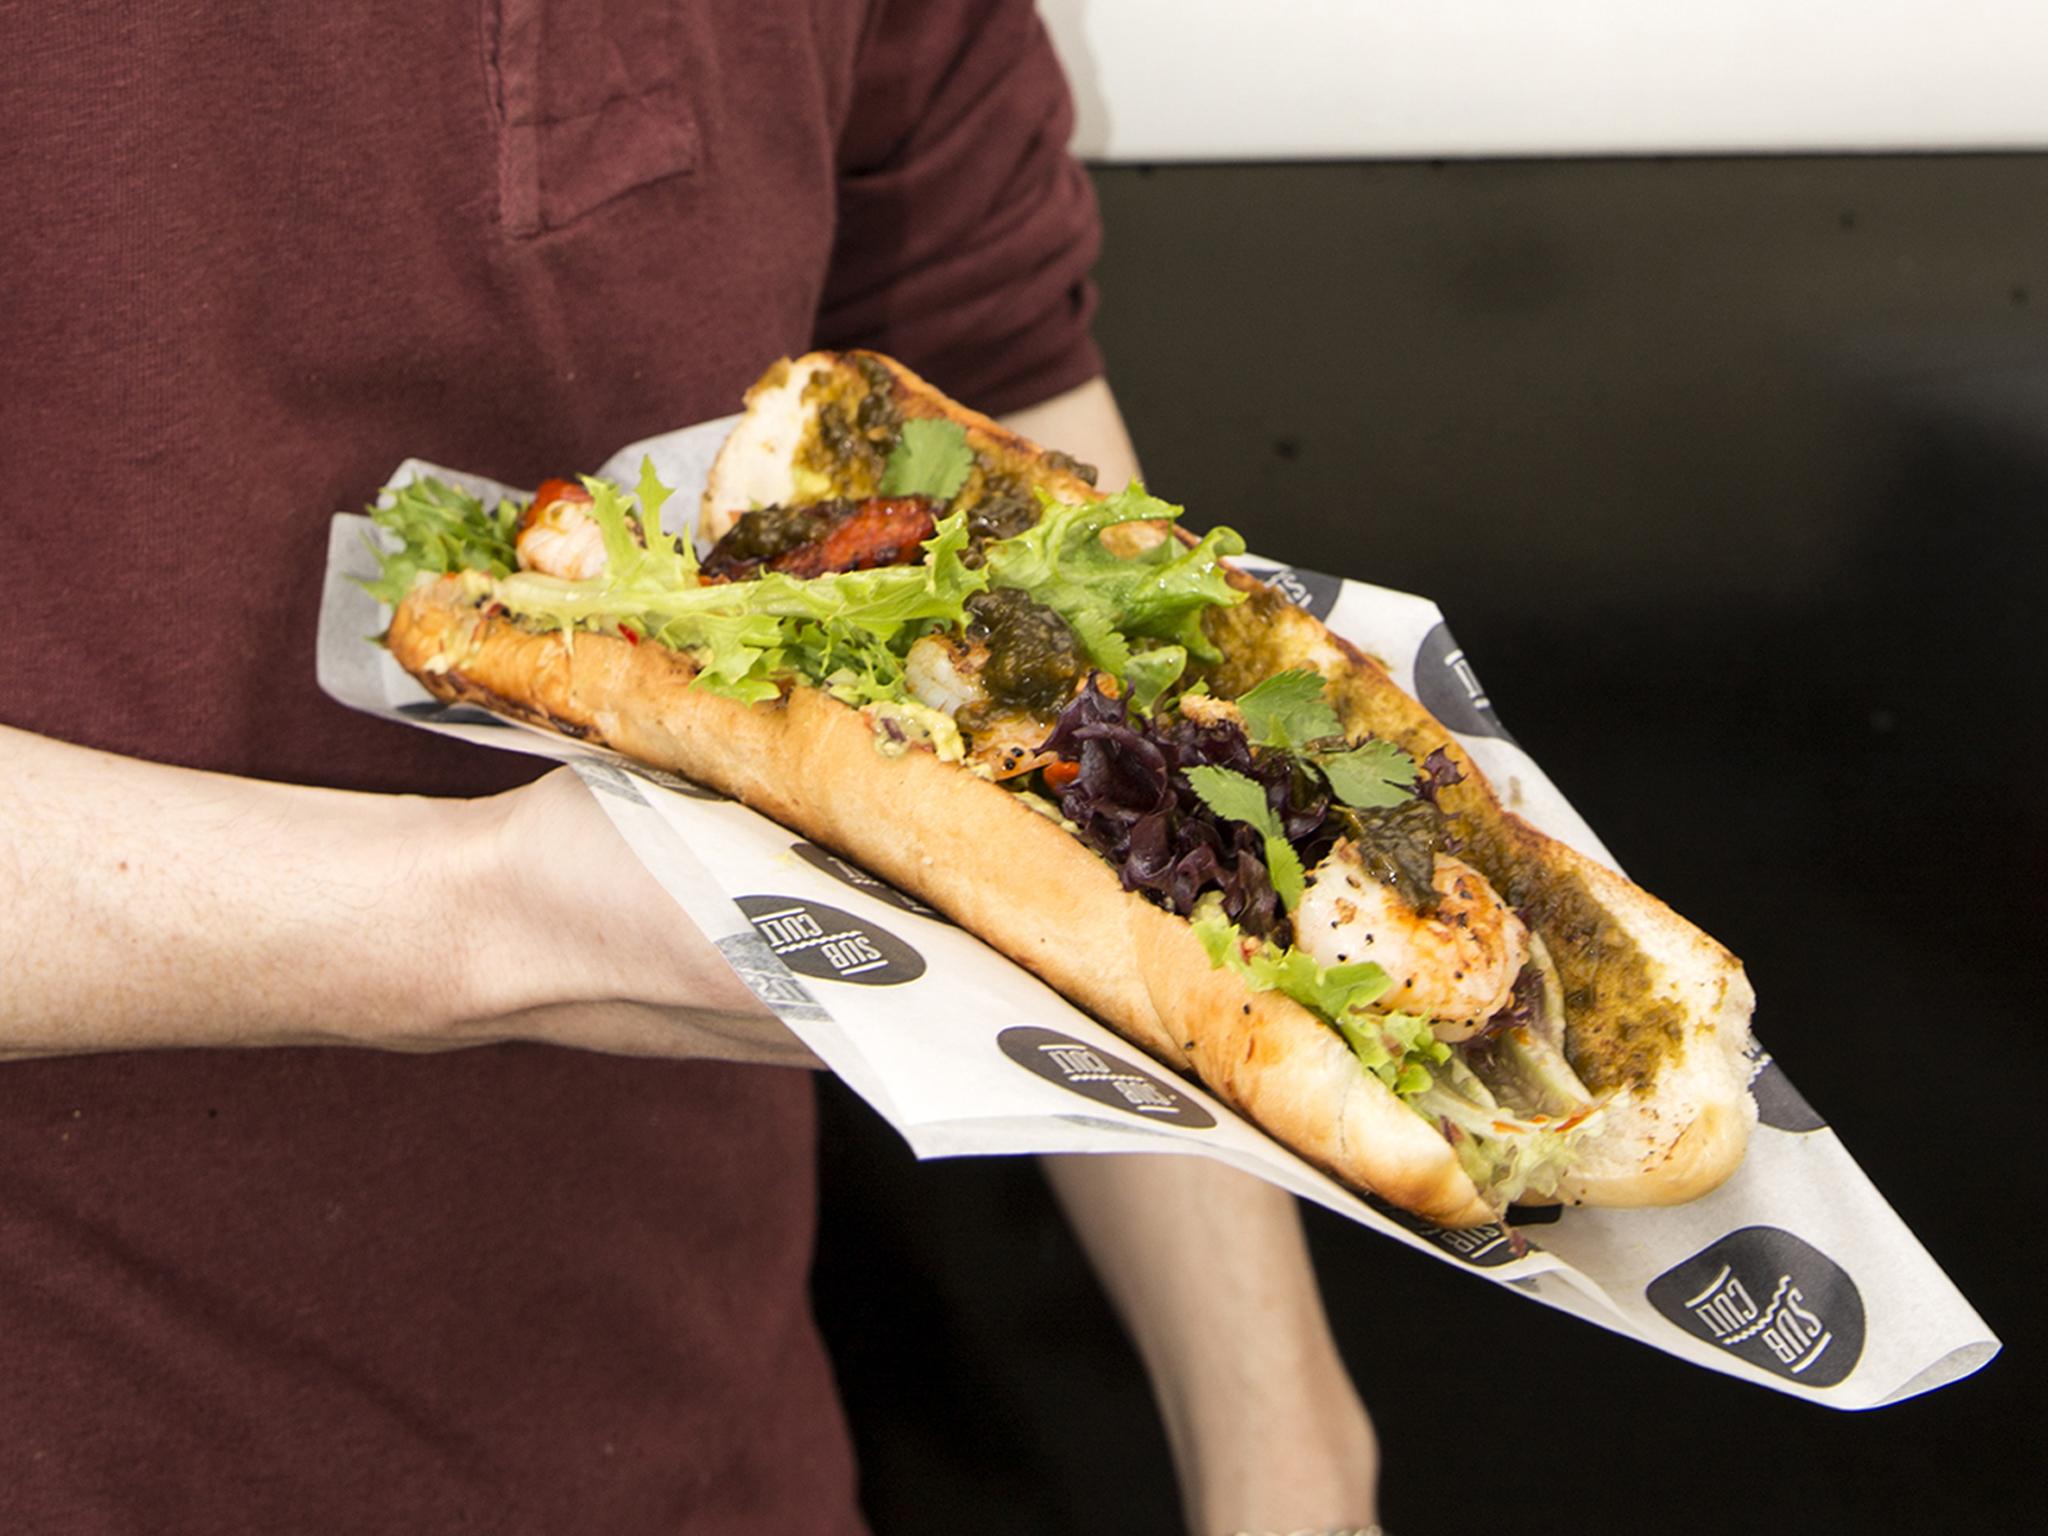 Sub Cult's street food submarine sandwich